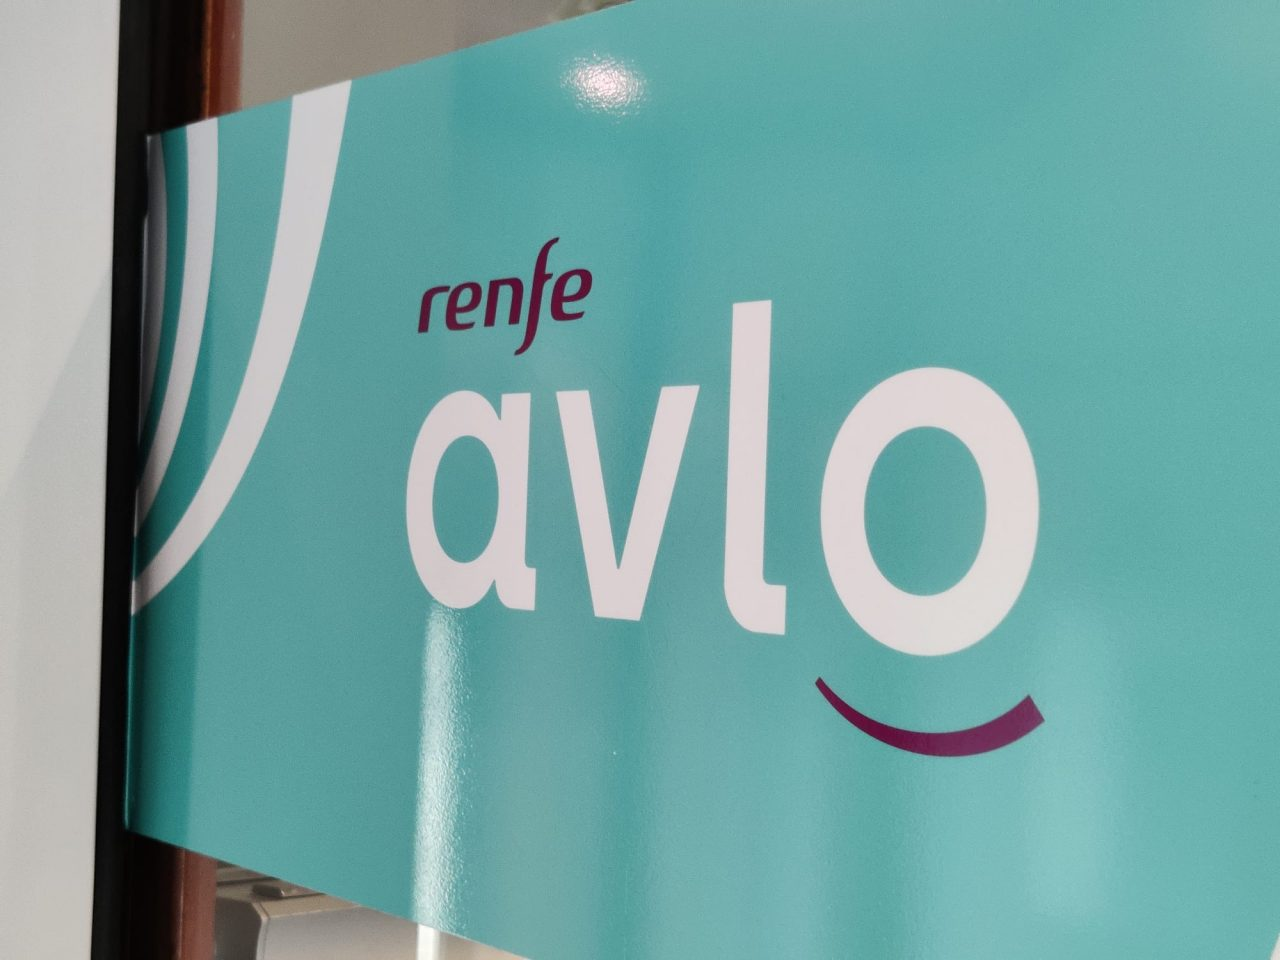 Renfe AVLO Low Cost7